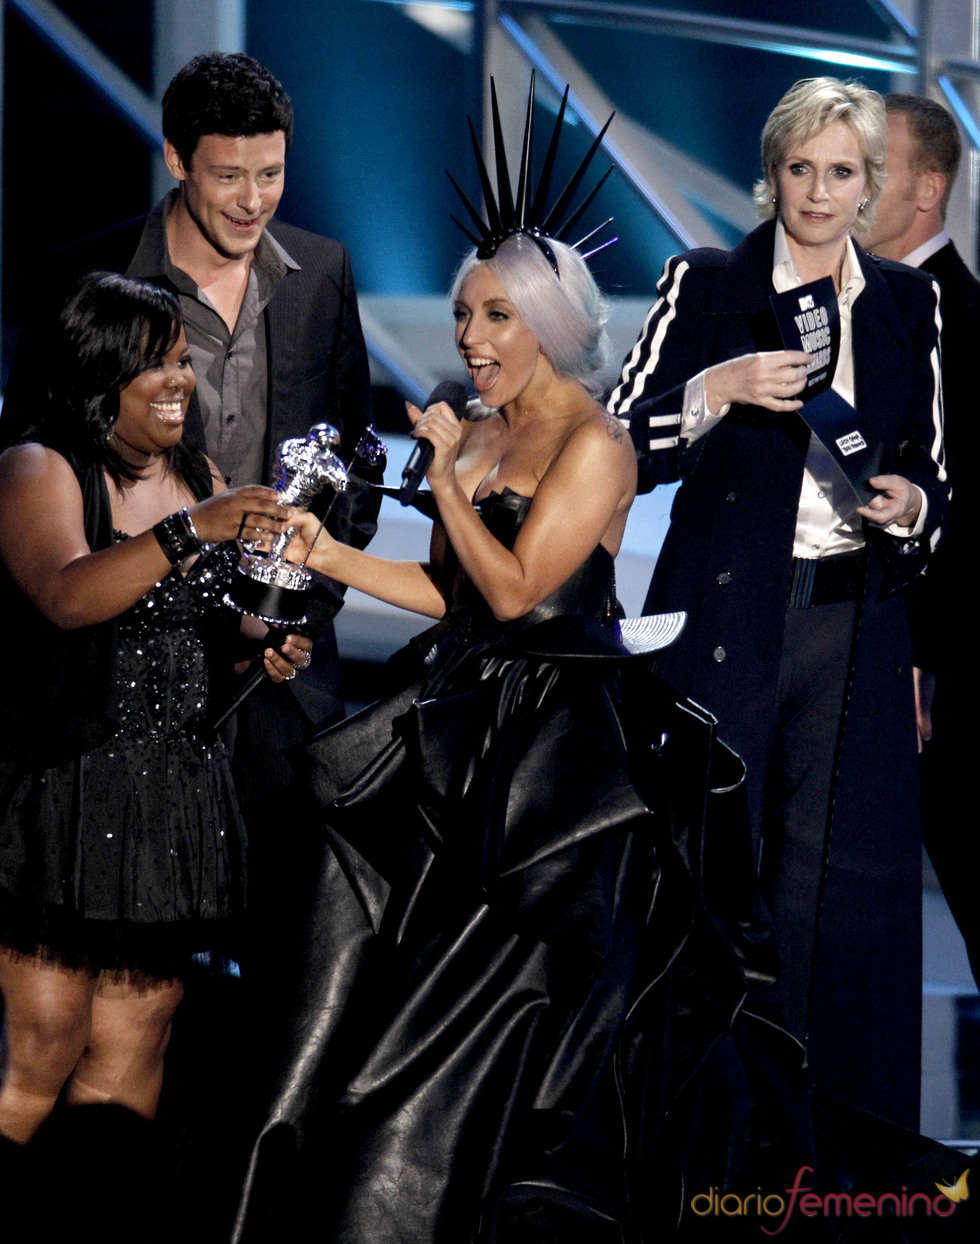 Lady Gaga, premiada en los MTV Video Music Awards 2010